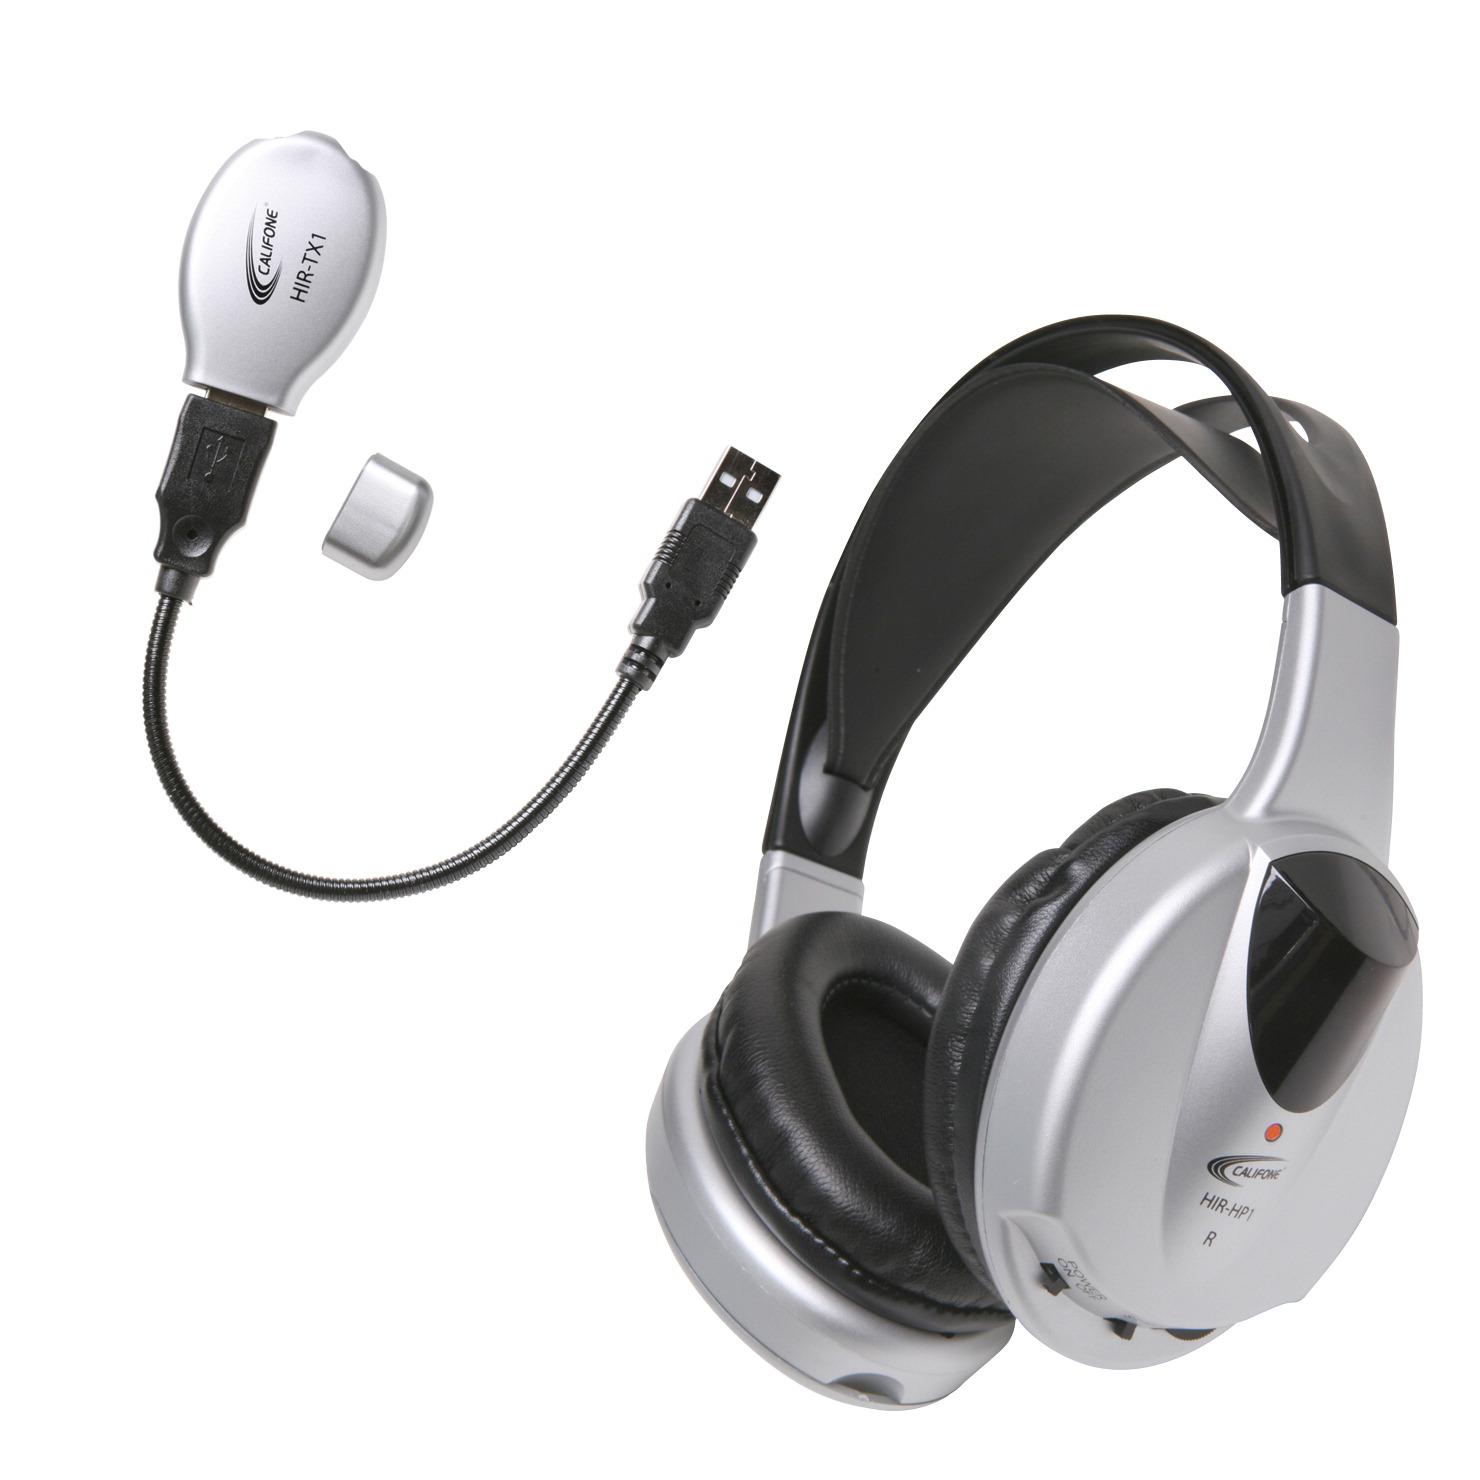 Califone HIR-KT1 Wireless Stereo/Mono Headphones with USB Transmitter, 2.3 Hz - SCHOOL SPECIALTY ...